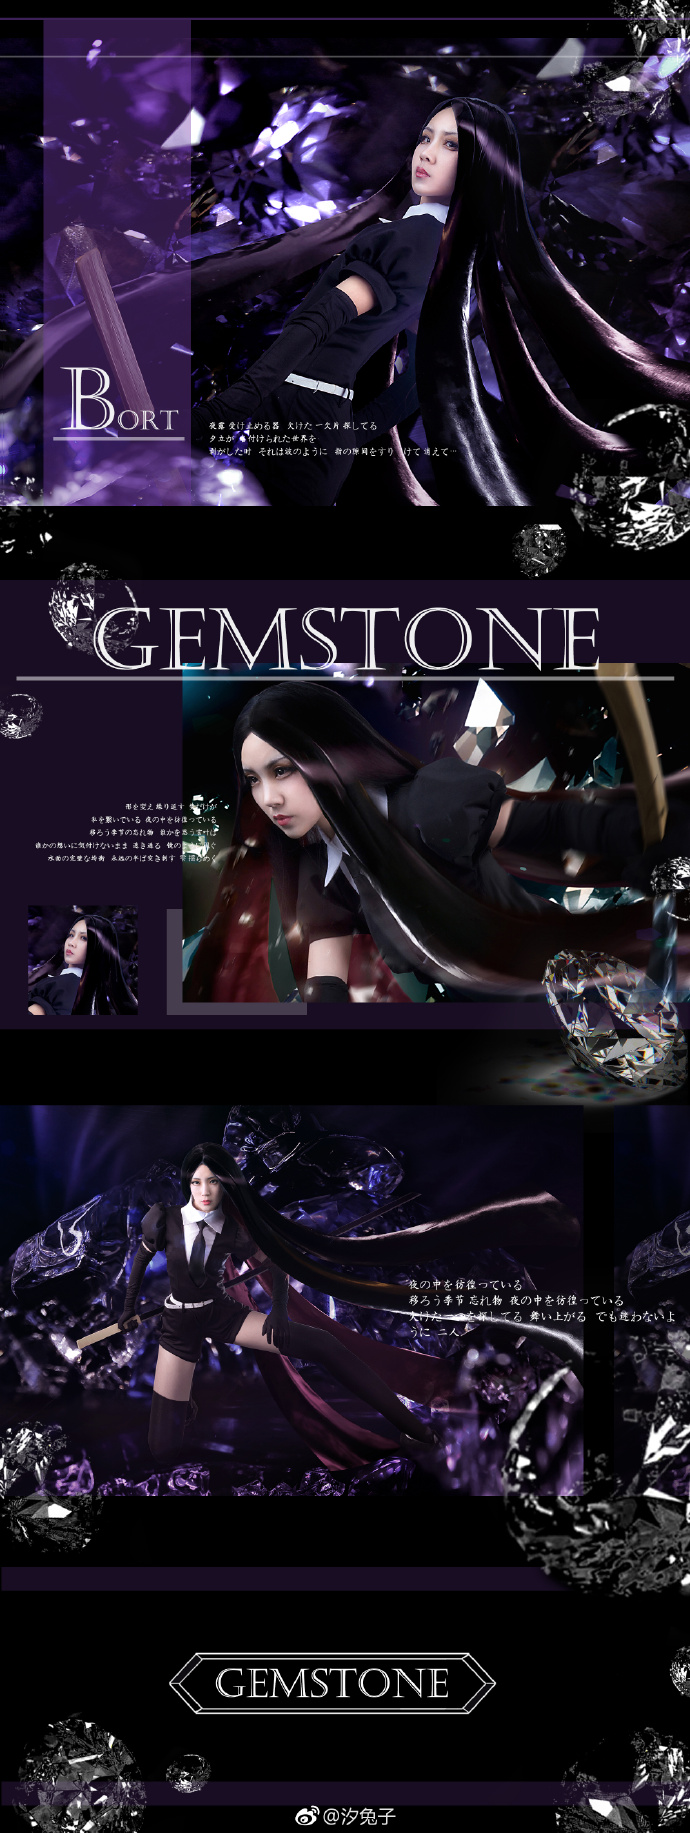 【cos正片】可以说是非常还原《宝石之后》钻石组 cosplay欣赏 cosplay-第3张